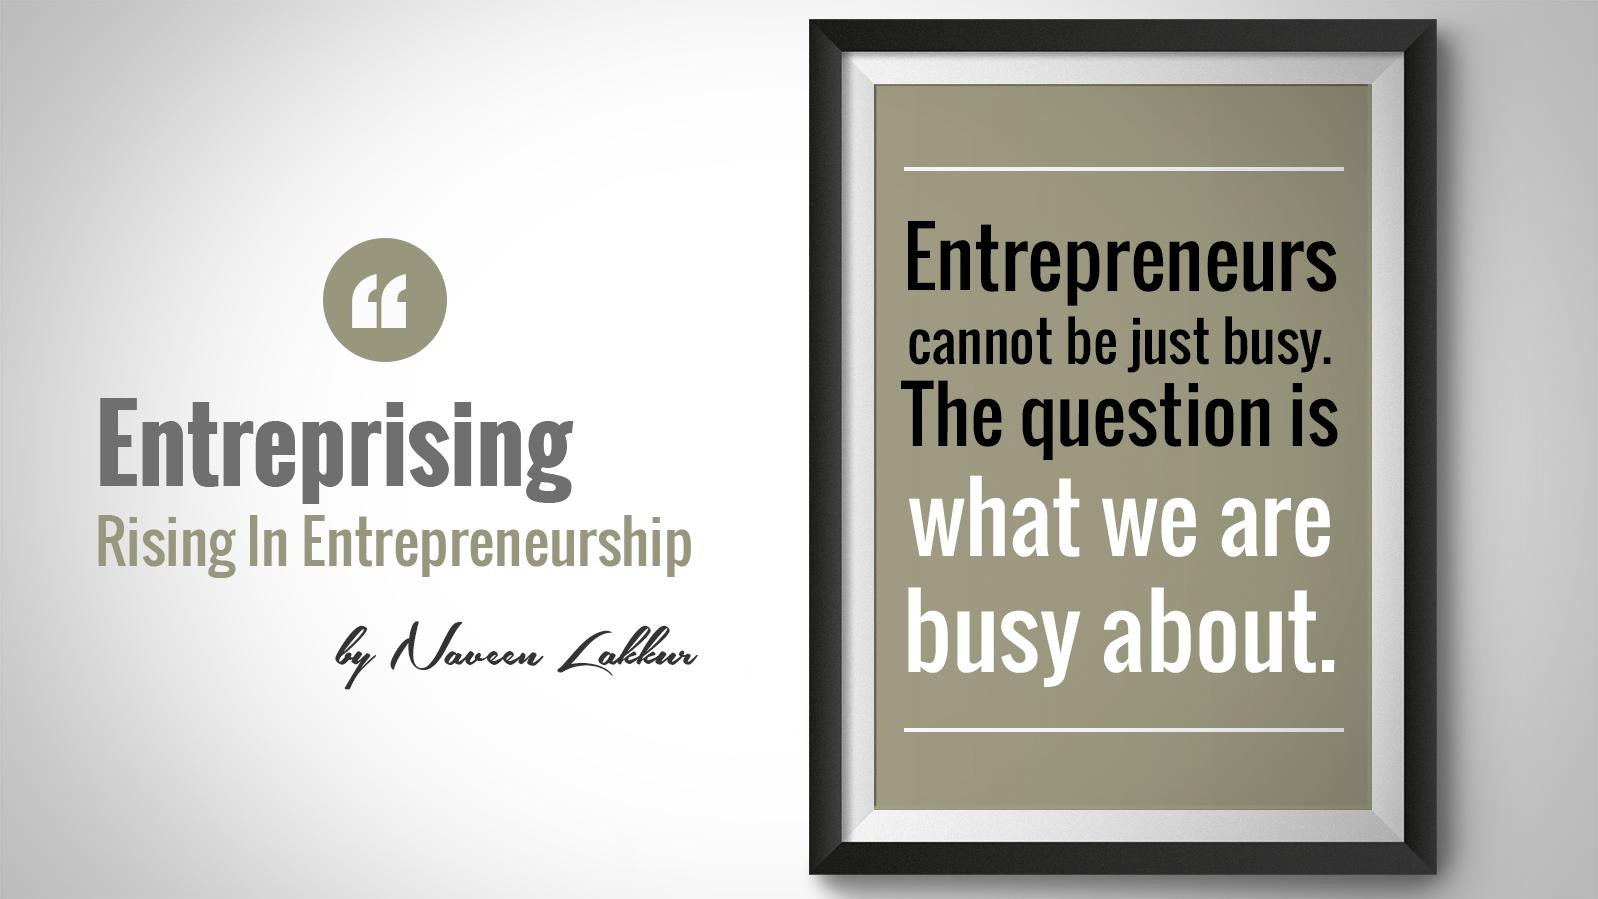 Entrepreneurs are Busy